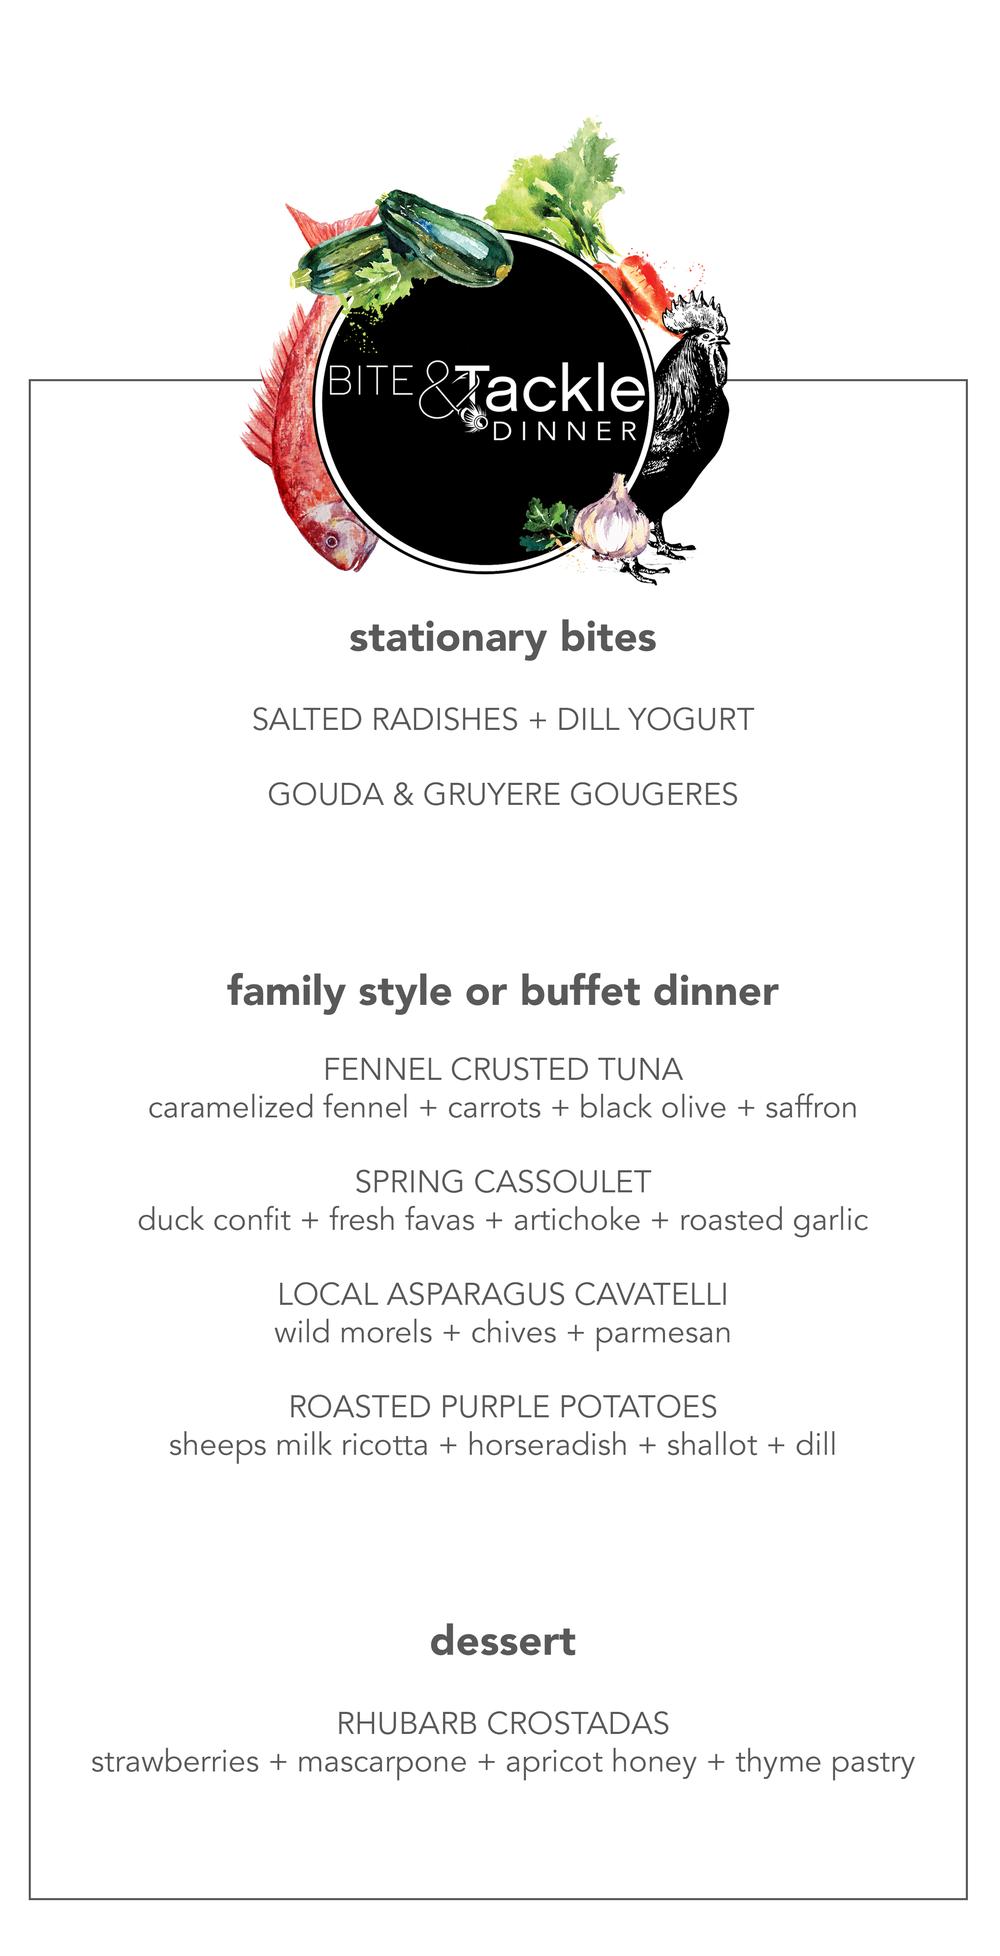 BITE & Tackle NYC Spring Dinner Menu